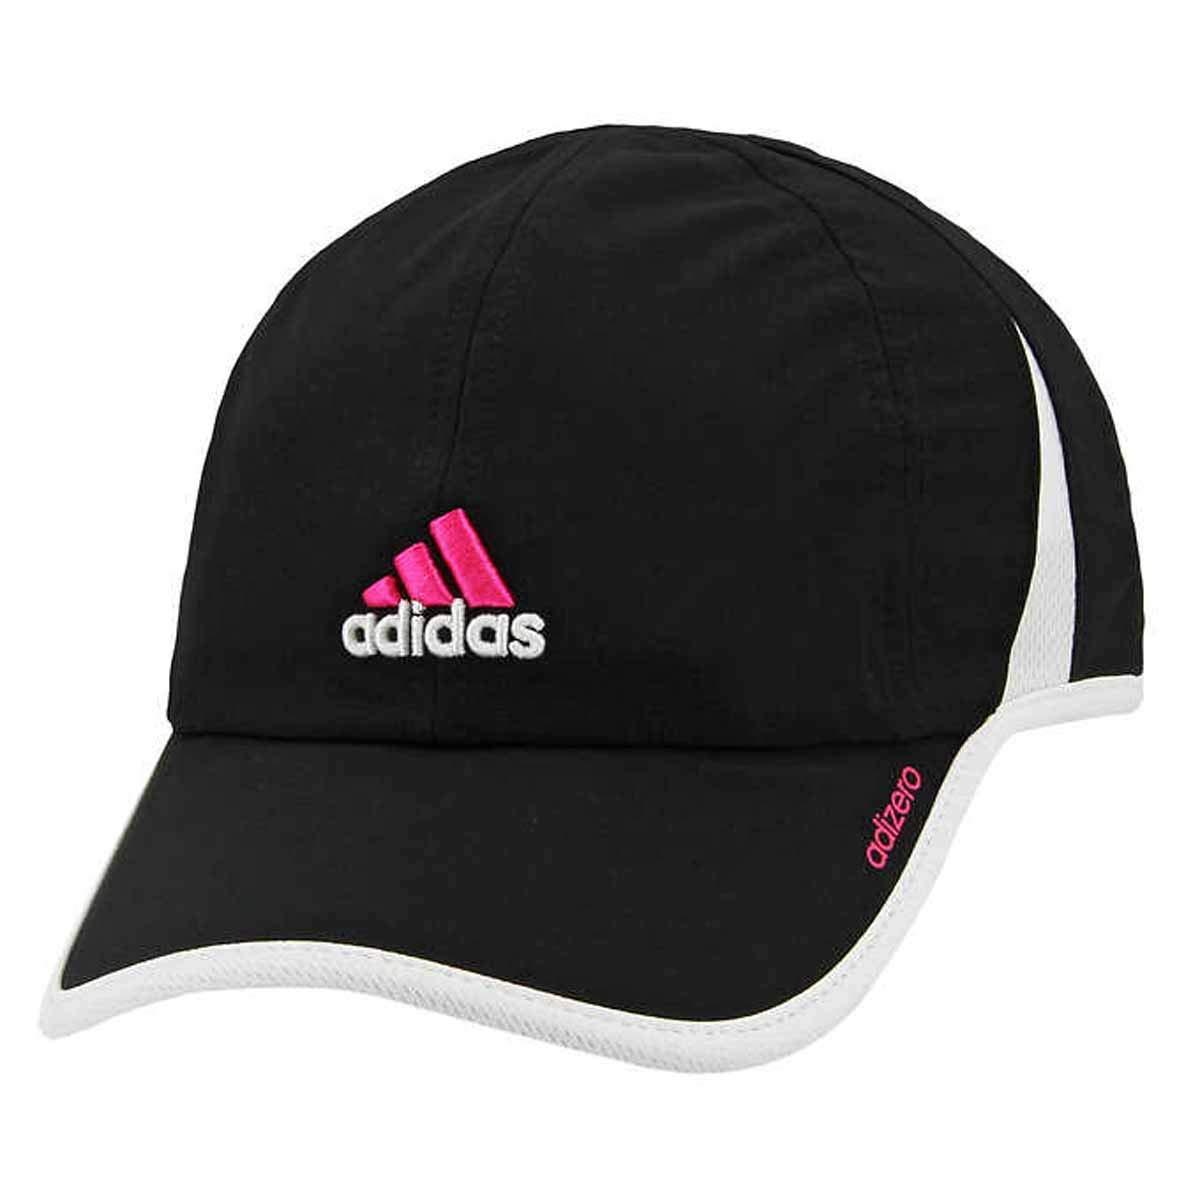 adidas Climacool Adizero - Gorra de Golf para Mujer, Color Negro ...